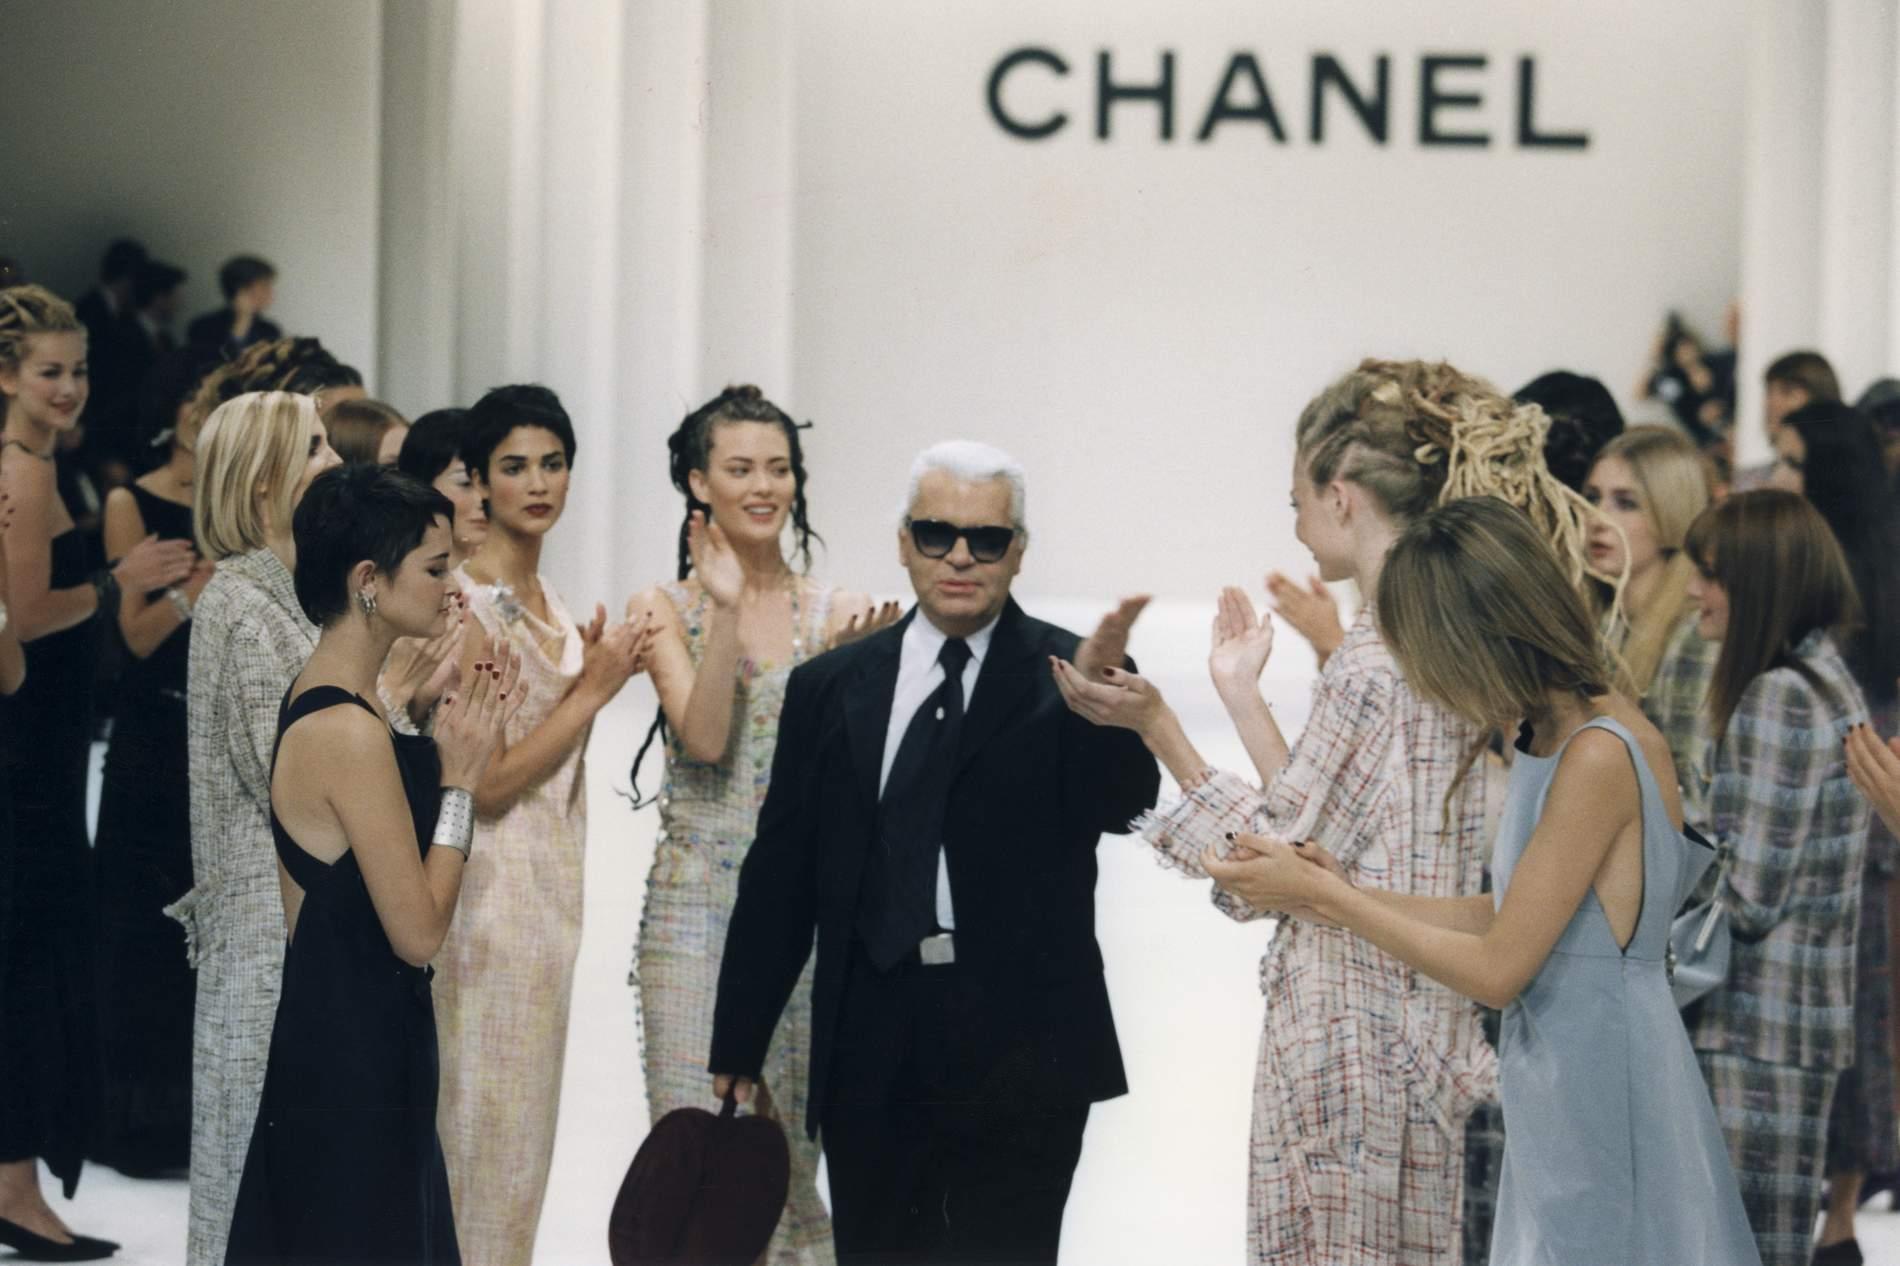 Remembering Karl Lagerfeld: The Chanel Designer Dies At 85 | PORTER